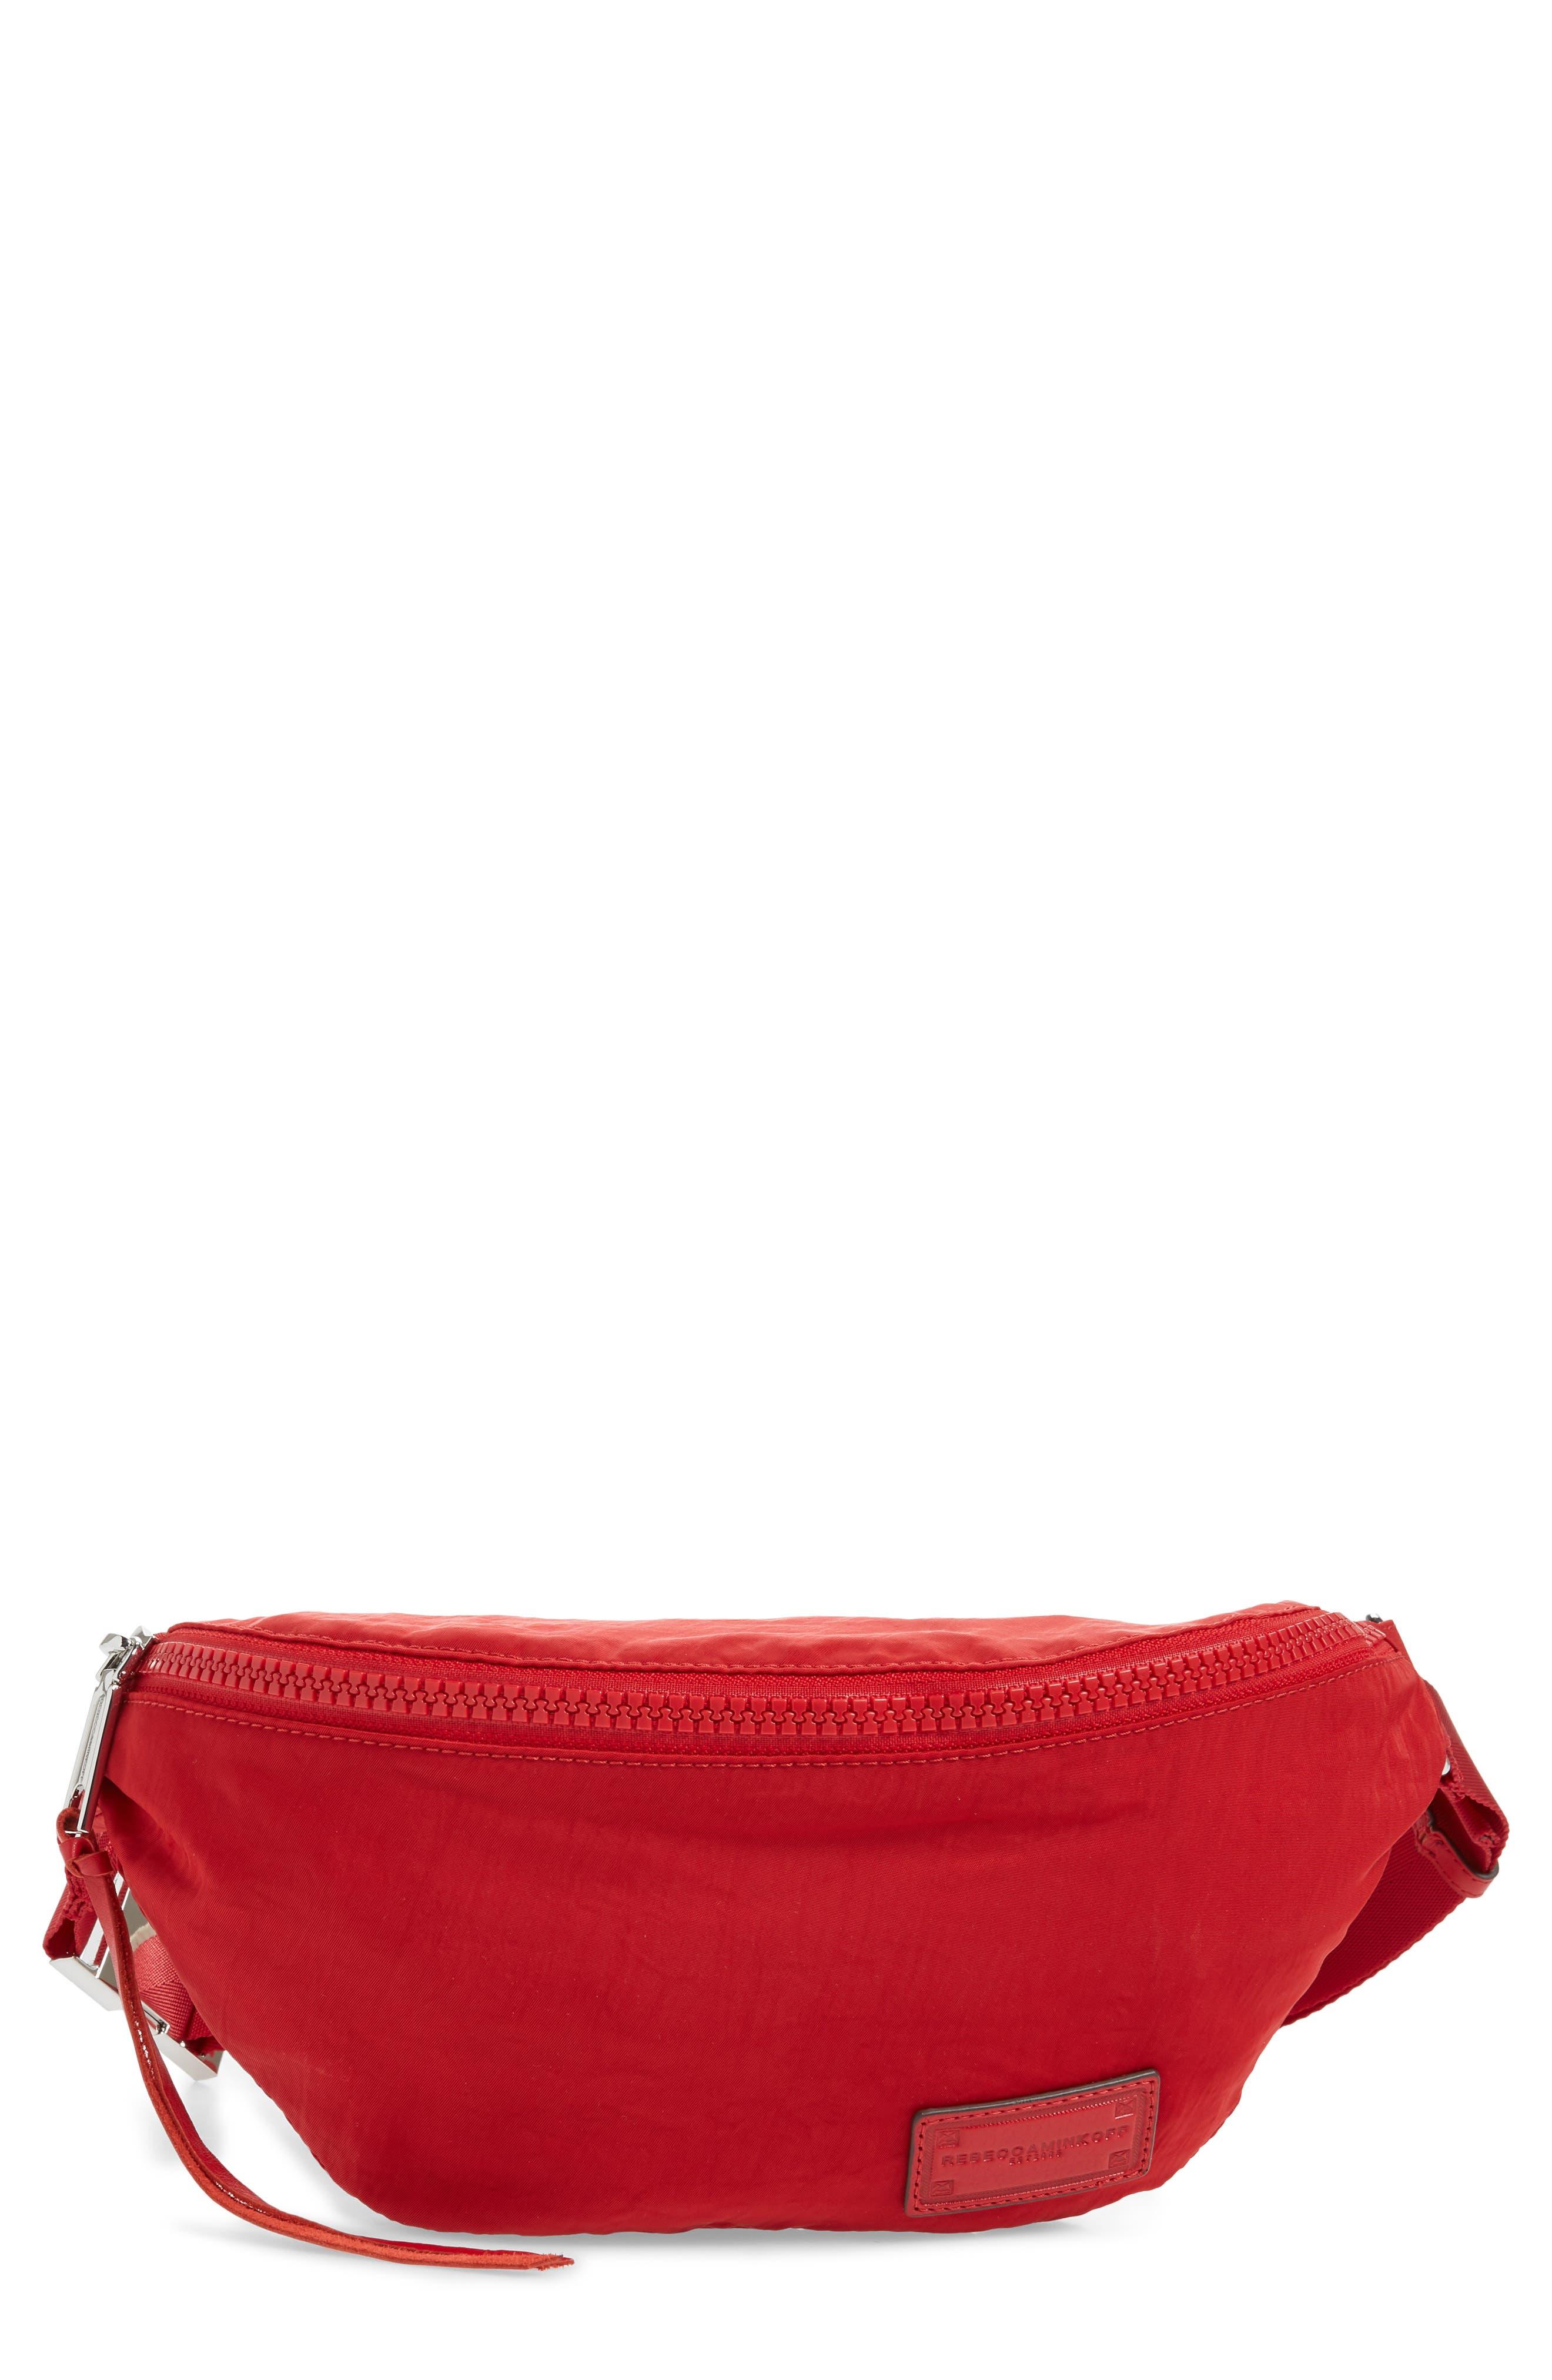 Nylon Belt Bag,                             Main thumbnail 1, color,                             SCARLET